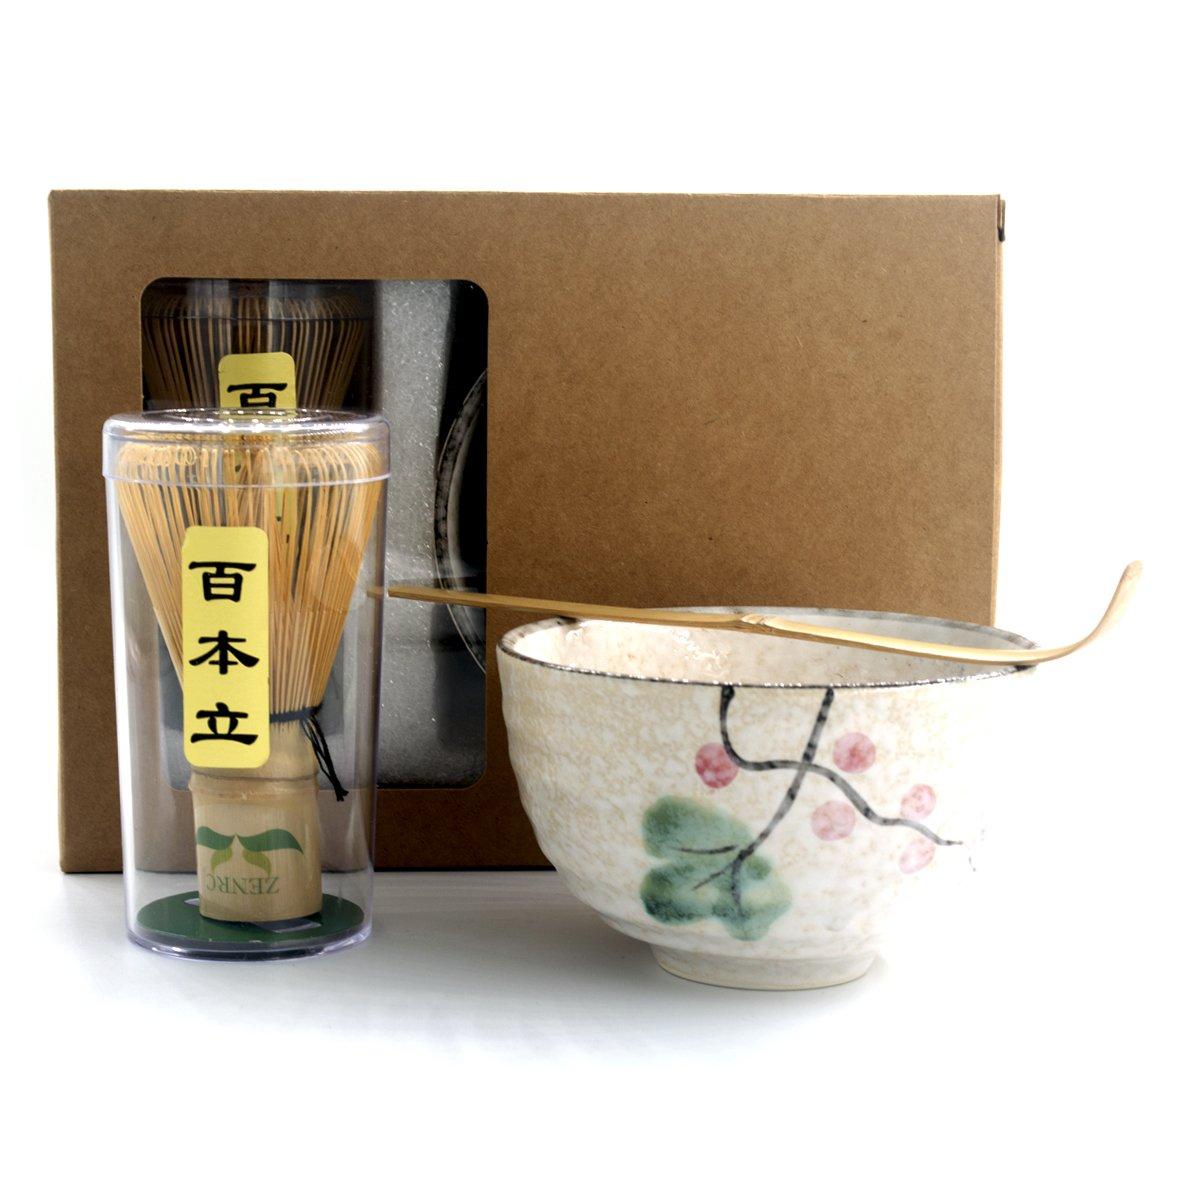 Complete Start Up Matcha Tea Kit - Retro Japanese Natural Bamboo Matcha Whisk ( Chasen ) - Scoop - Matcha Bowl - Whisk Holder - Ceremony Matcha tea Sets (Lotus flower, 3/PC Set) by ZENRC